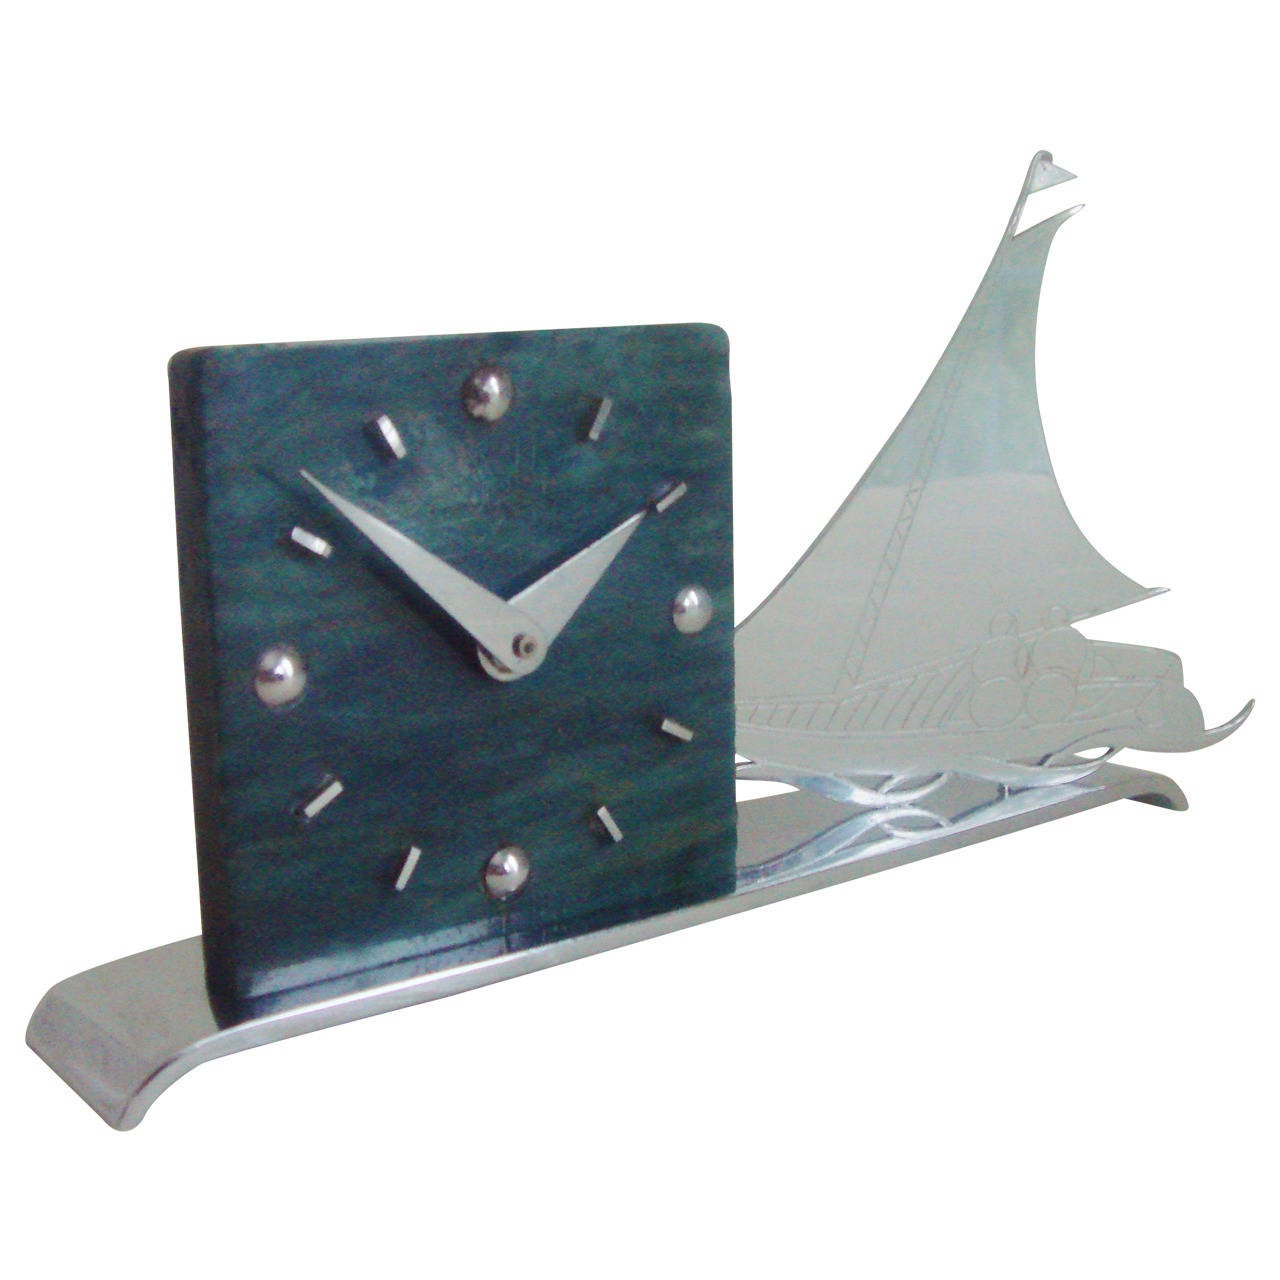 French Art Deco Figurative Marbled Galalith & Chrome Racing Yacht Shelf Clock.